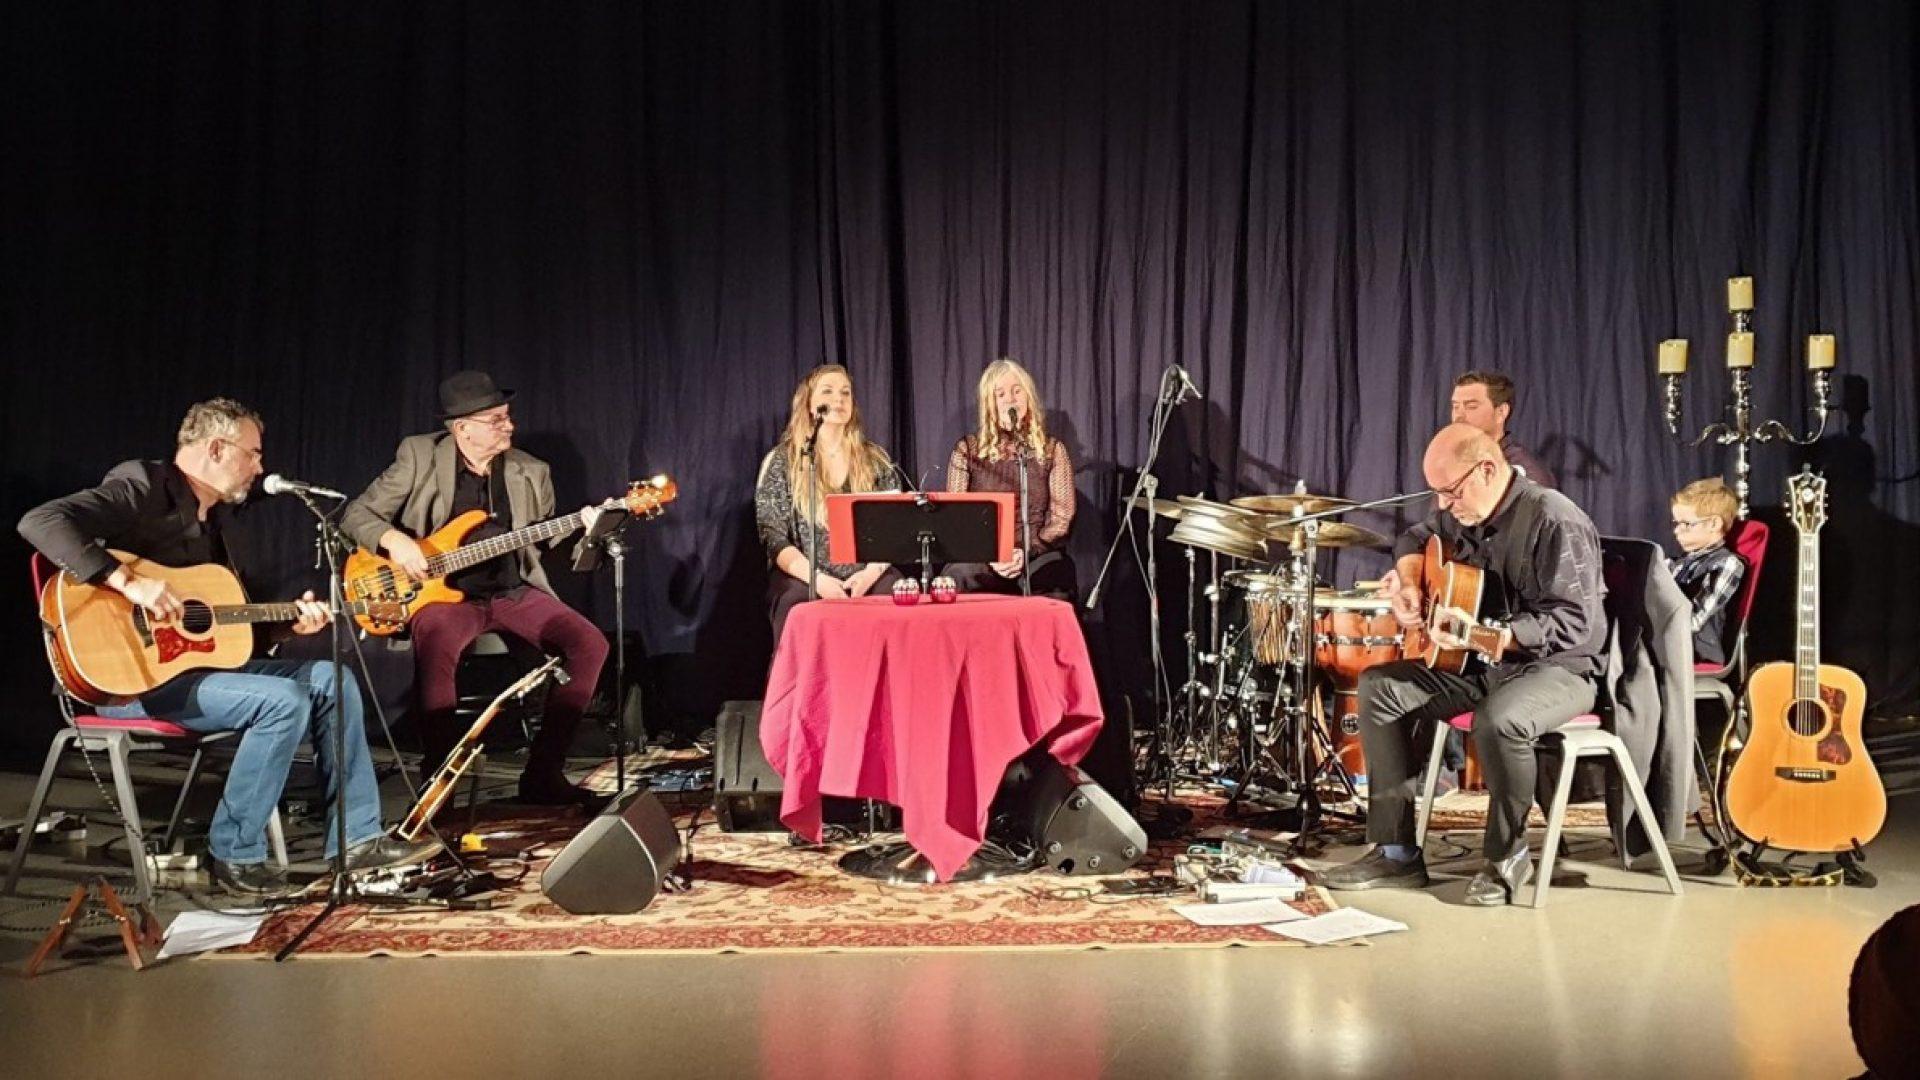 Bandet Det runde bord på scena